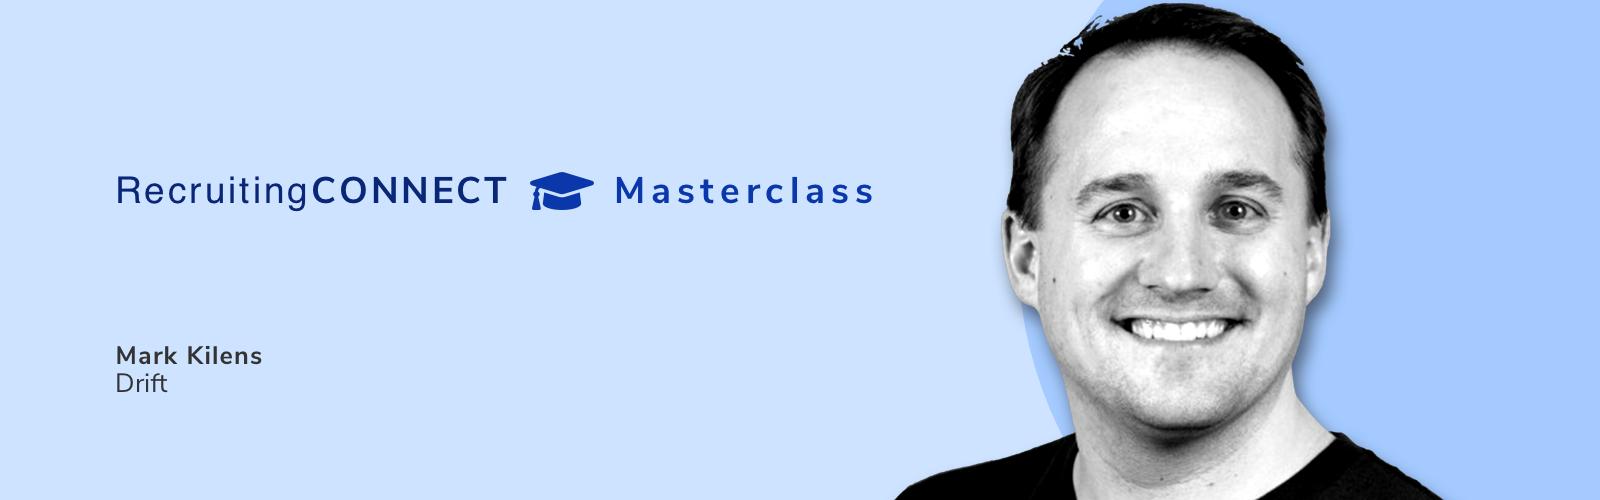 Talentry RecruitingCONNECT Masterclass Mark Kilens Drift